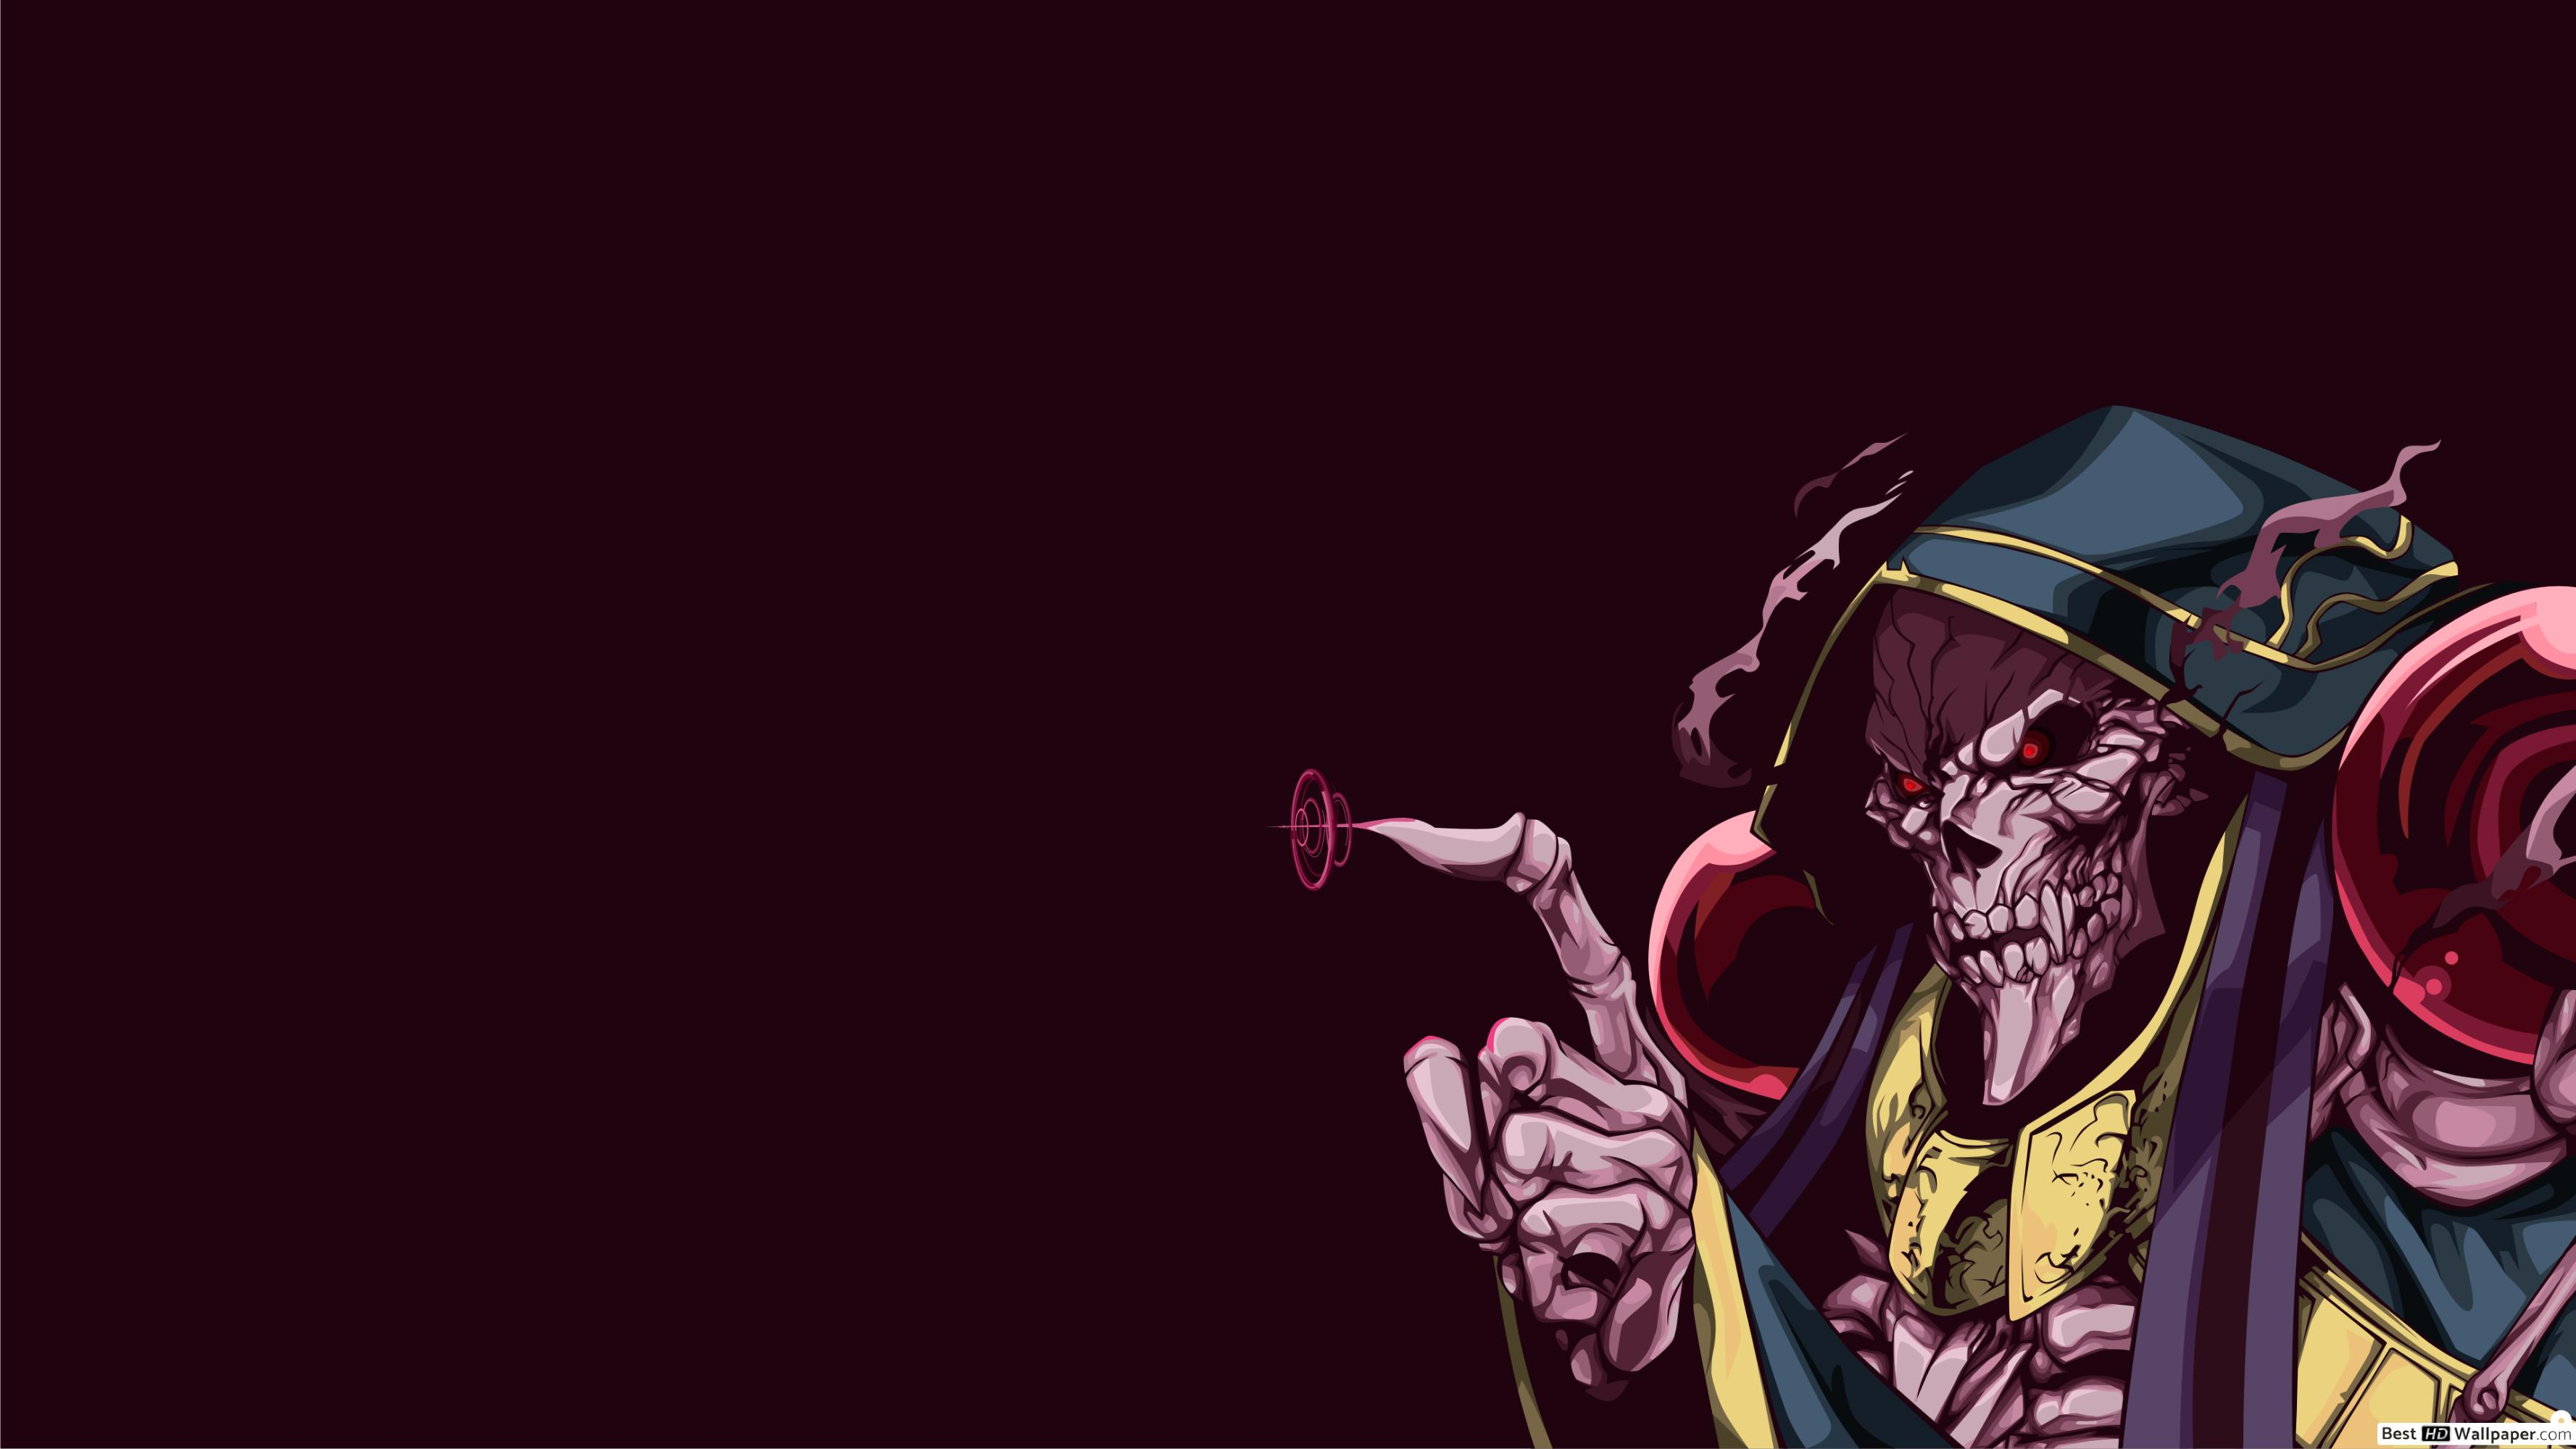 Uhd - Overlord Season 4 Release Date , HD Wallpaper & Backgrounds